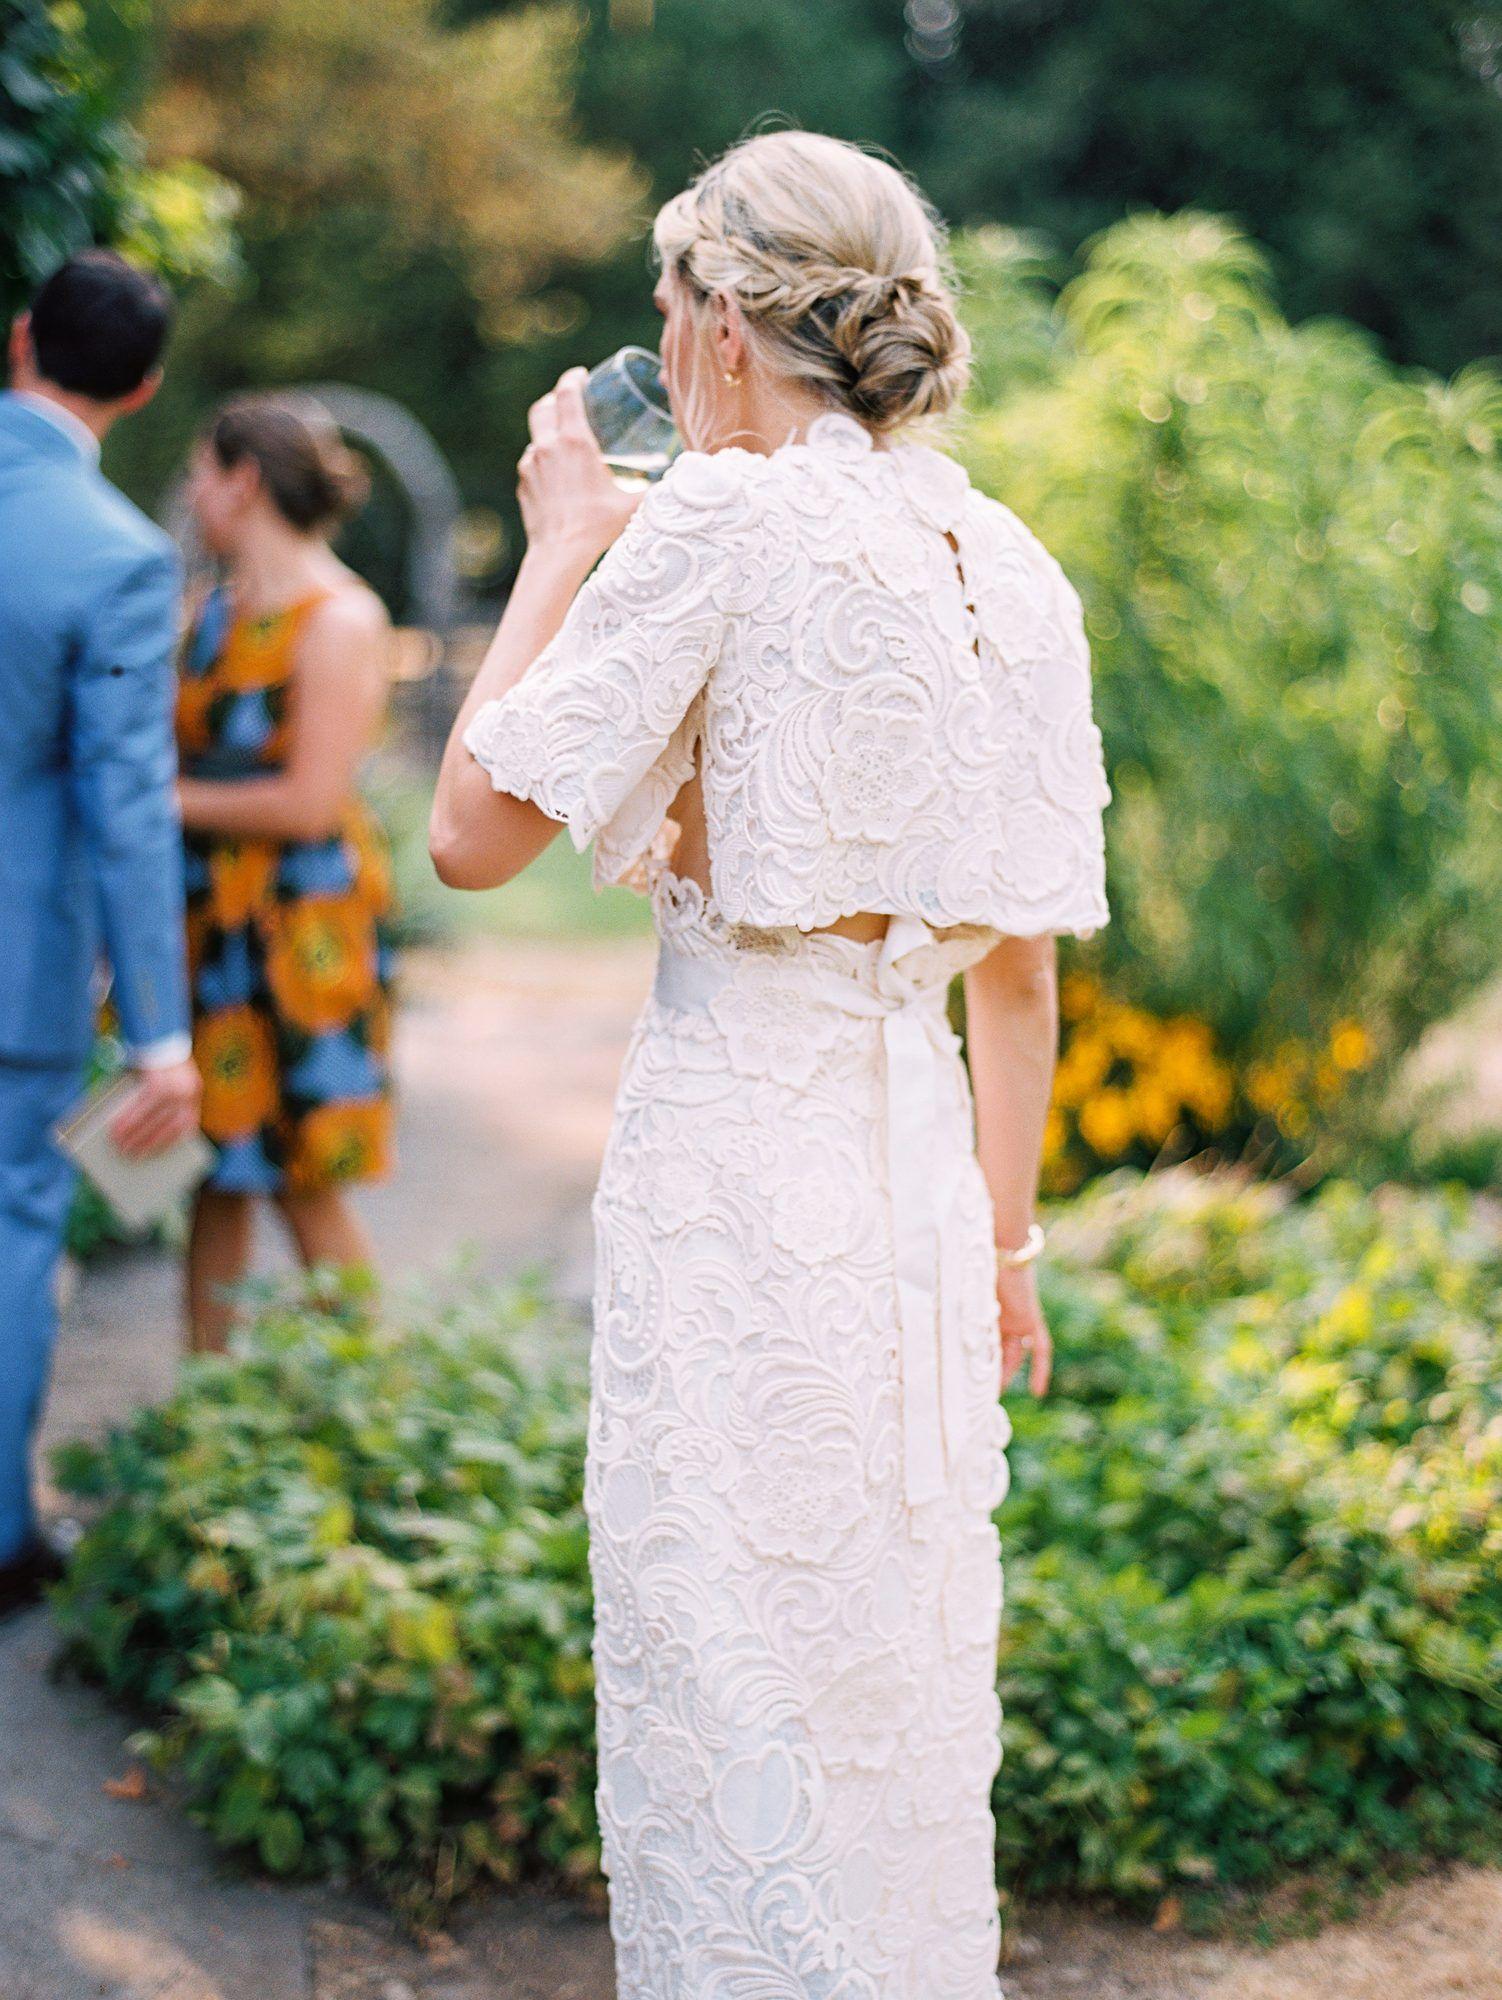 20 accesorios de boda llamativos usados por novias reales  – Boda